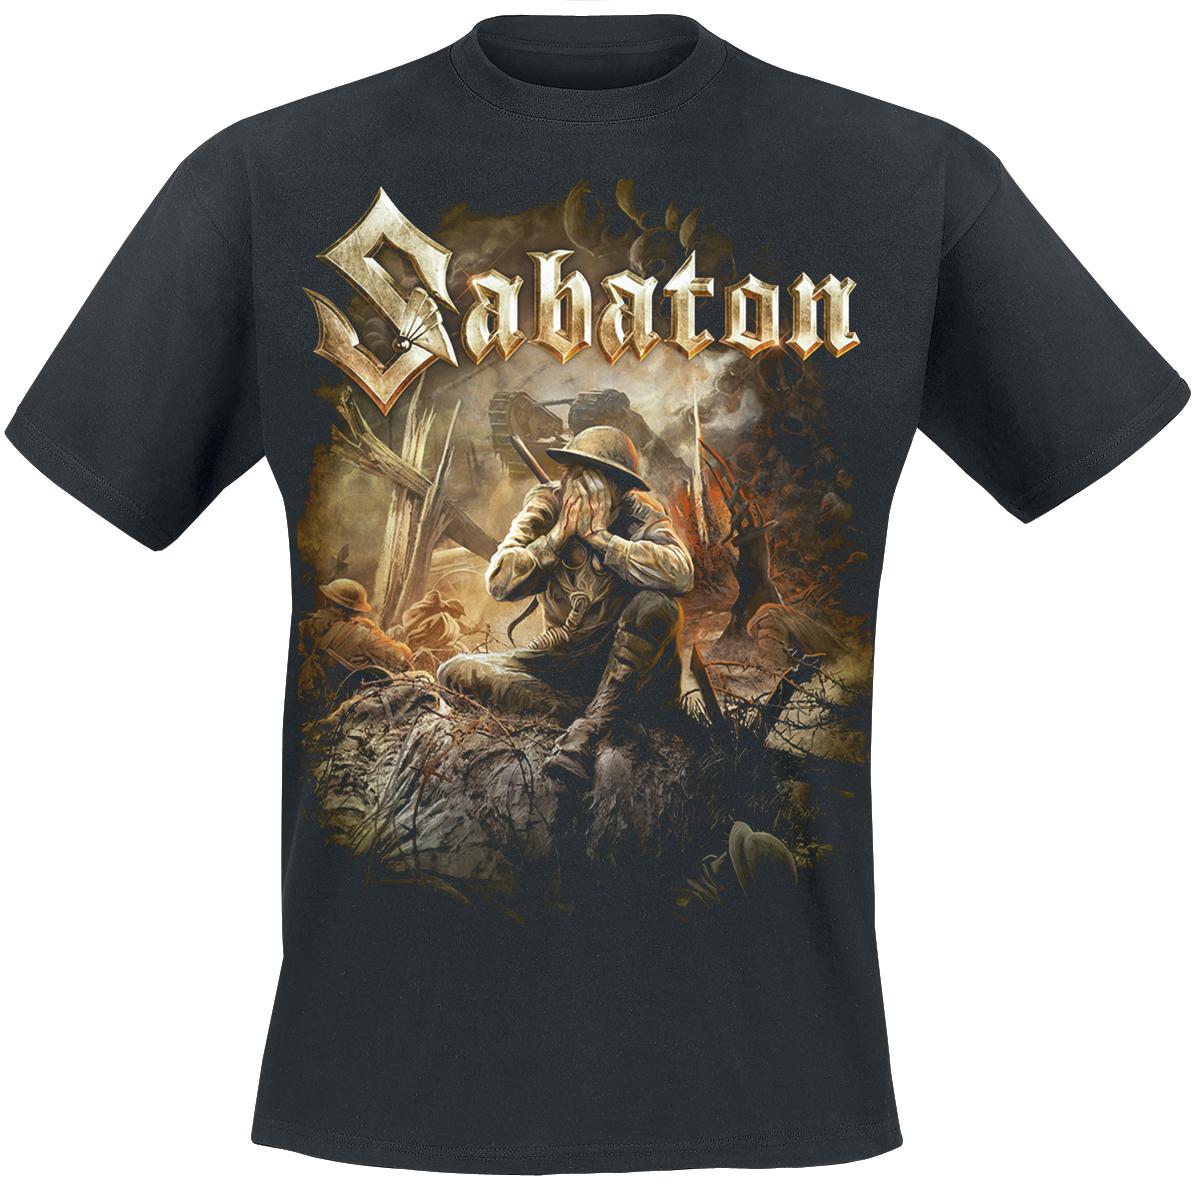 Sabaton - The Great War - T-Shirt - black image